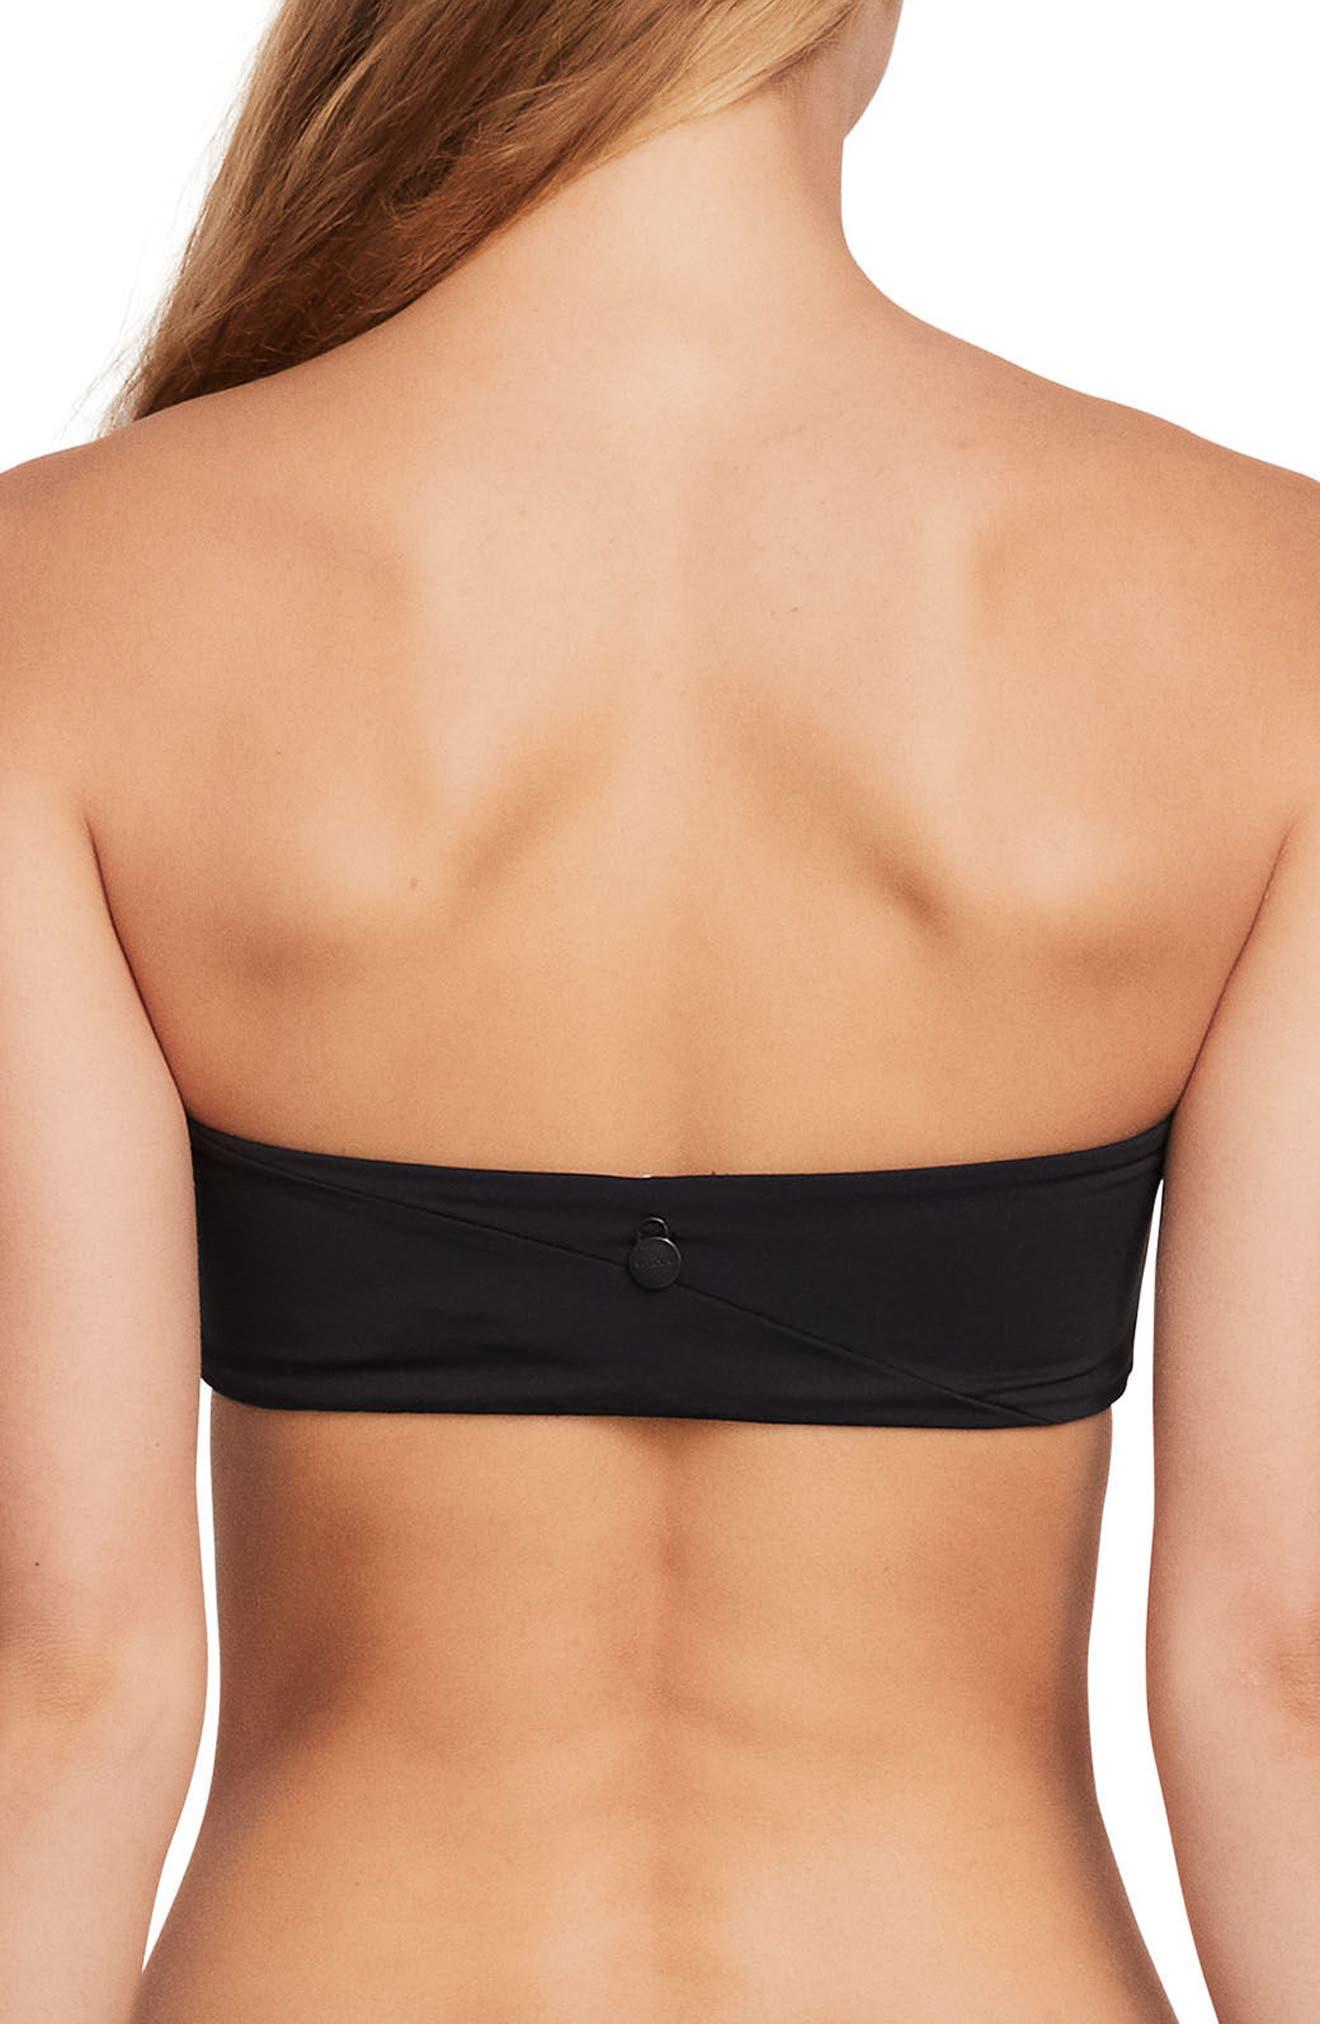 Simple Seamless Baseau Bikini Top,                             Alternate thumbnail 2, color,                             Black